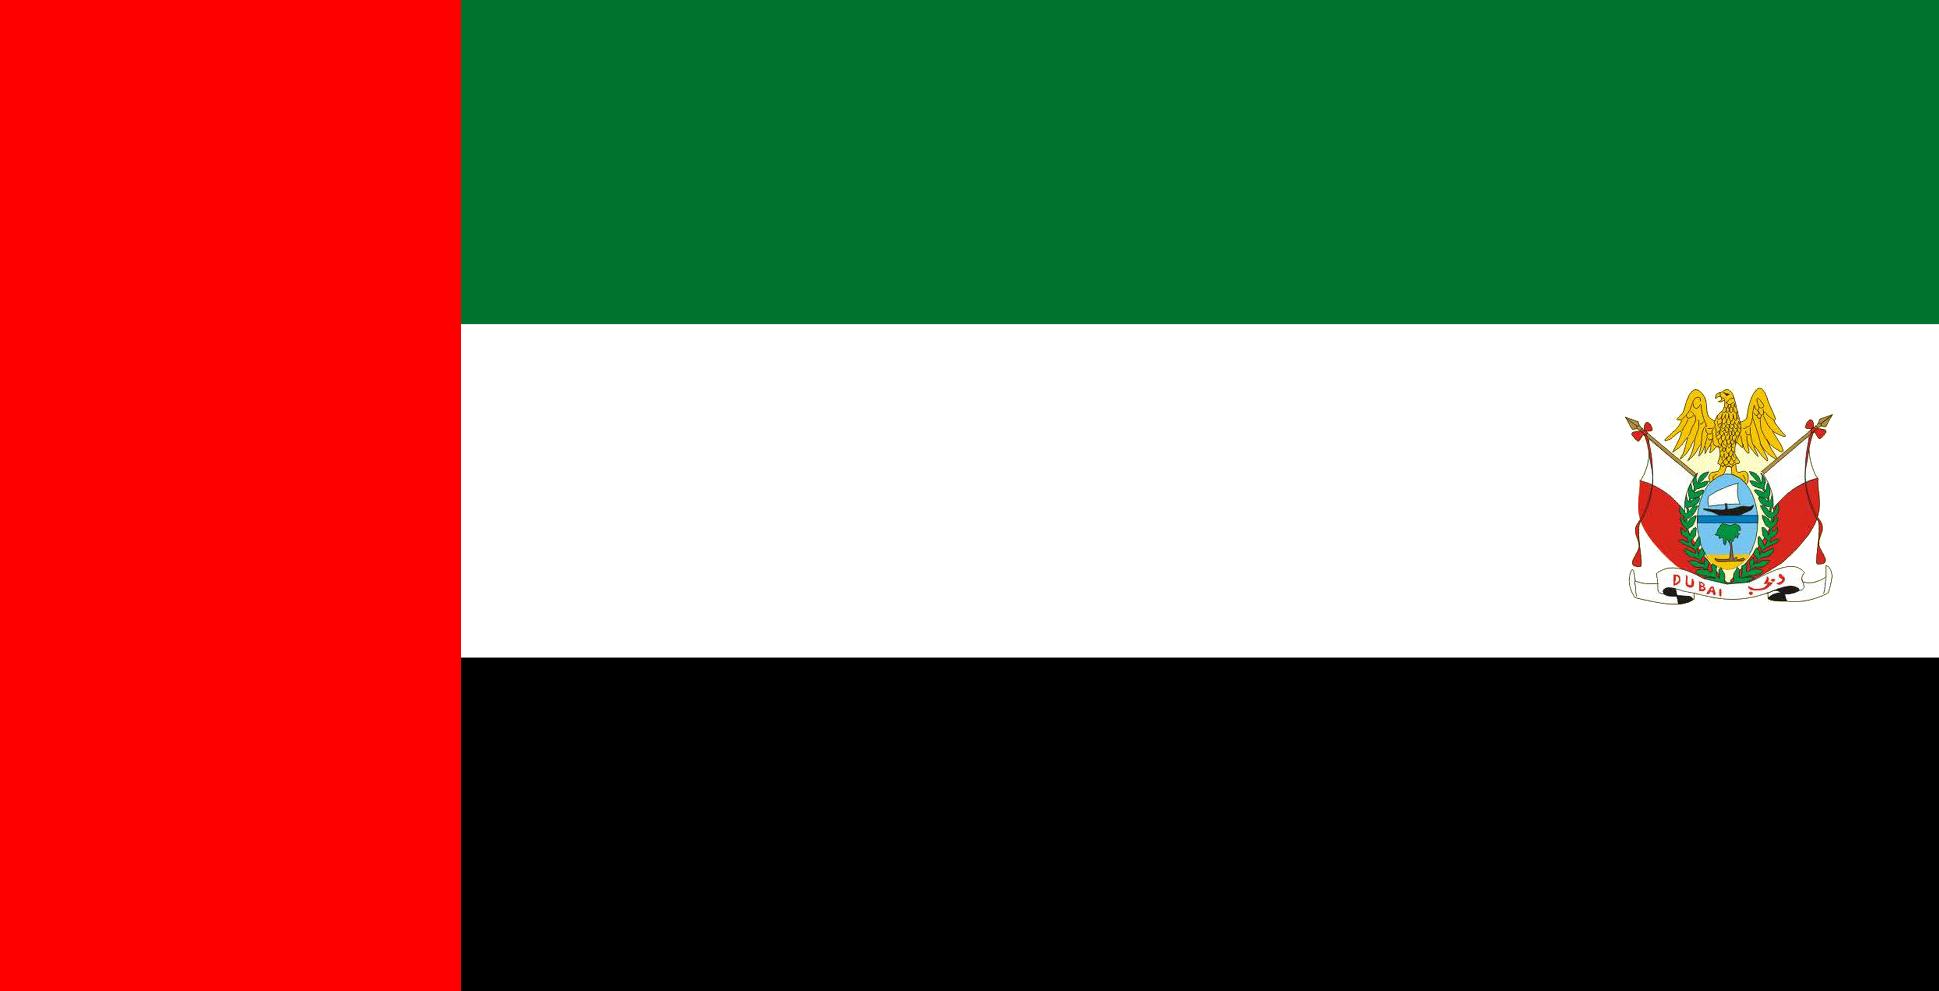 Crown Prince of Dubai - Wikipedia